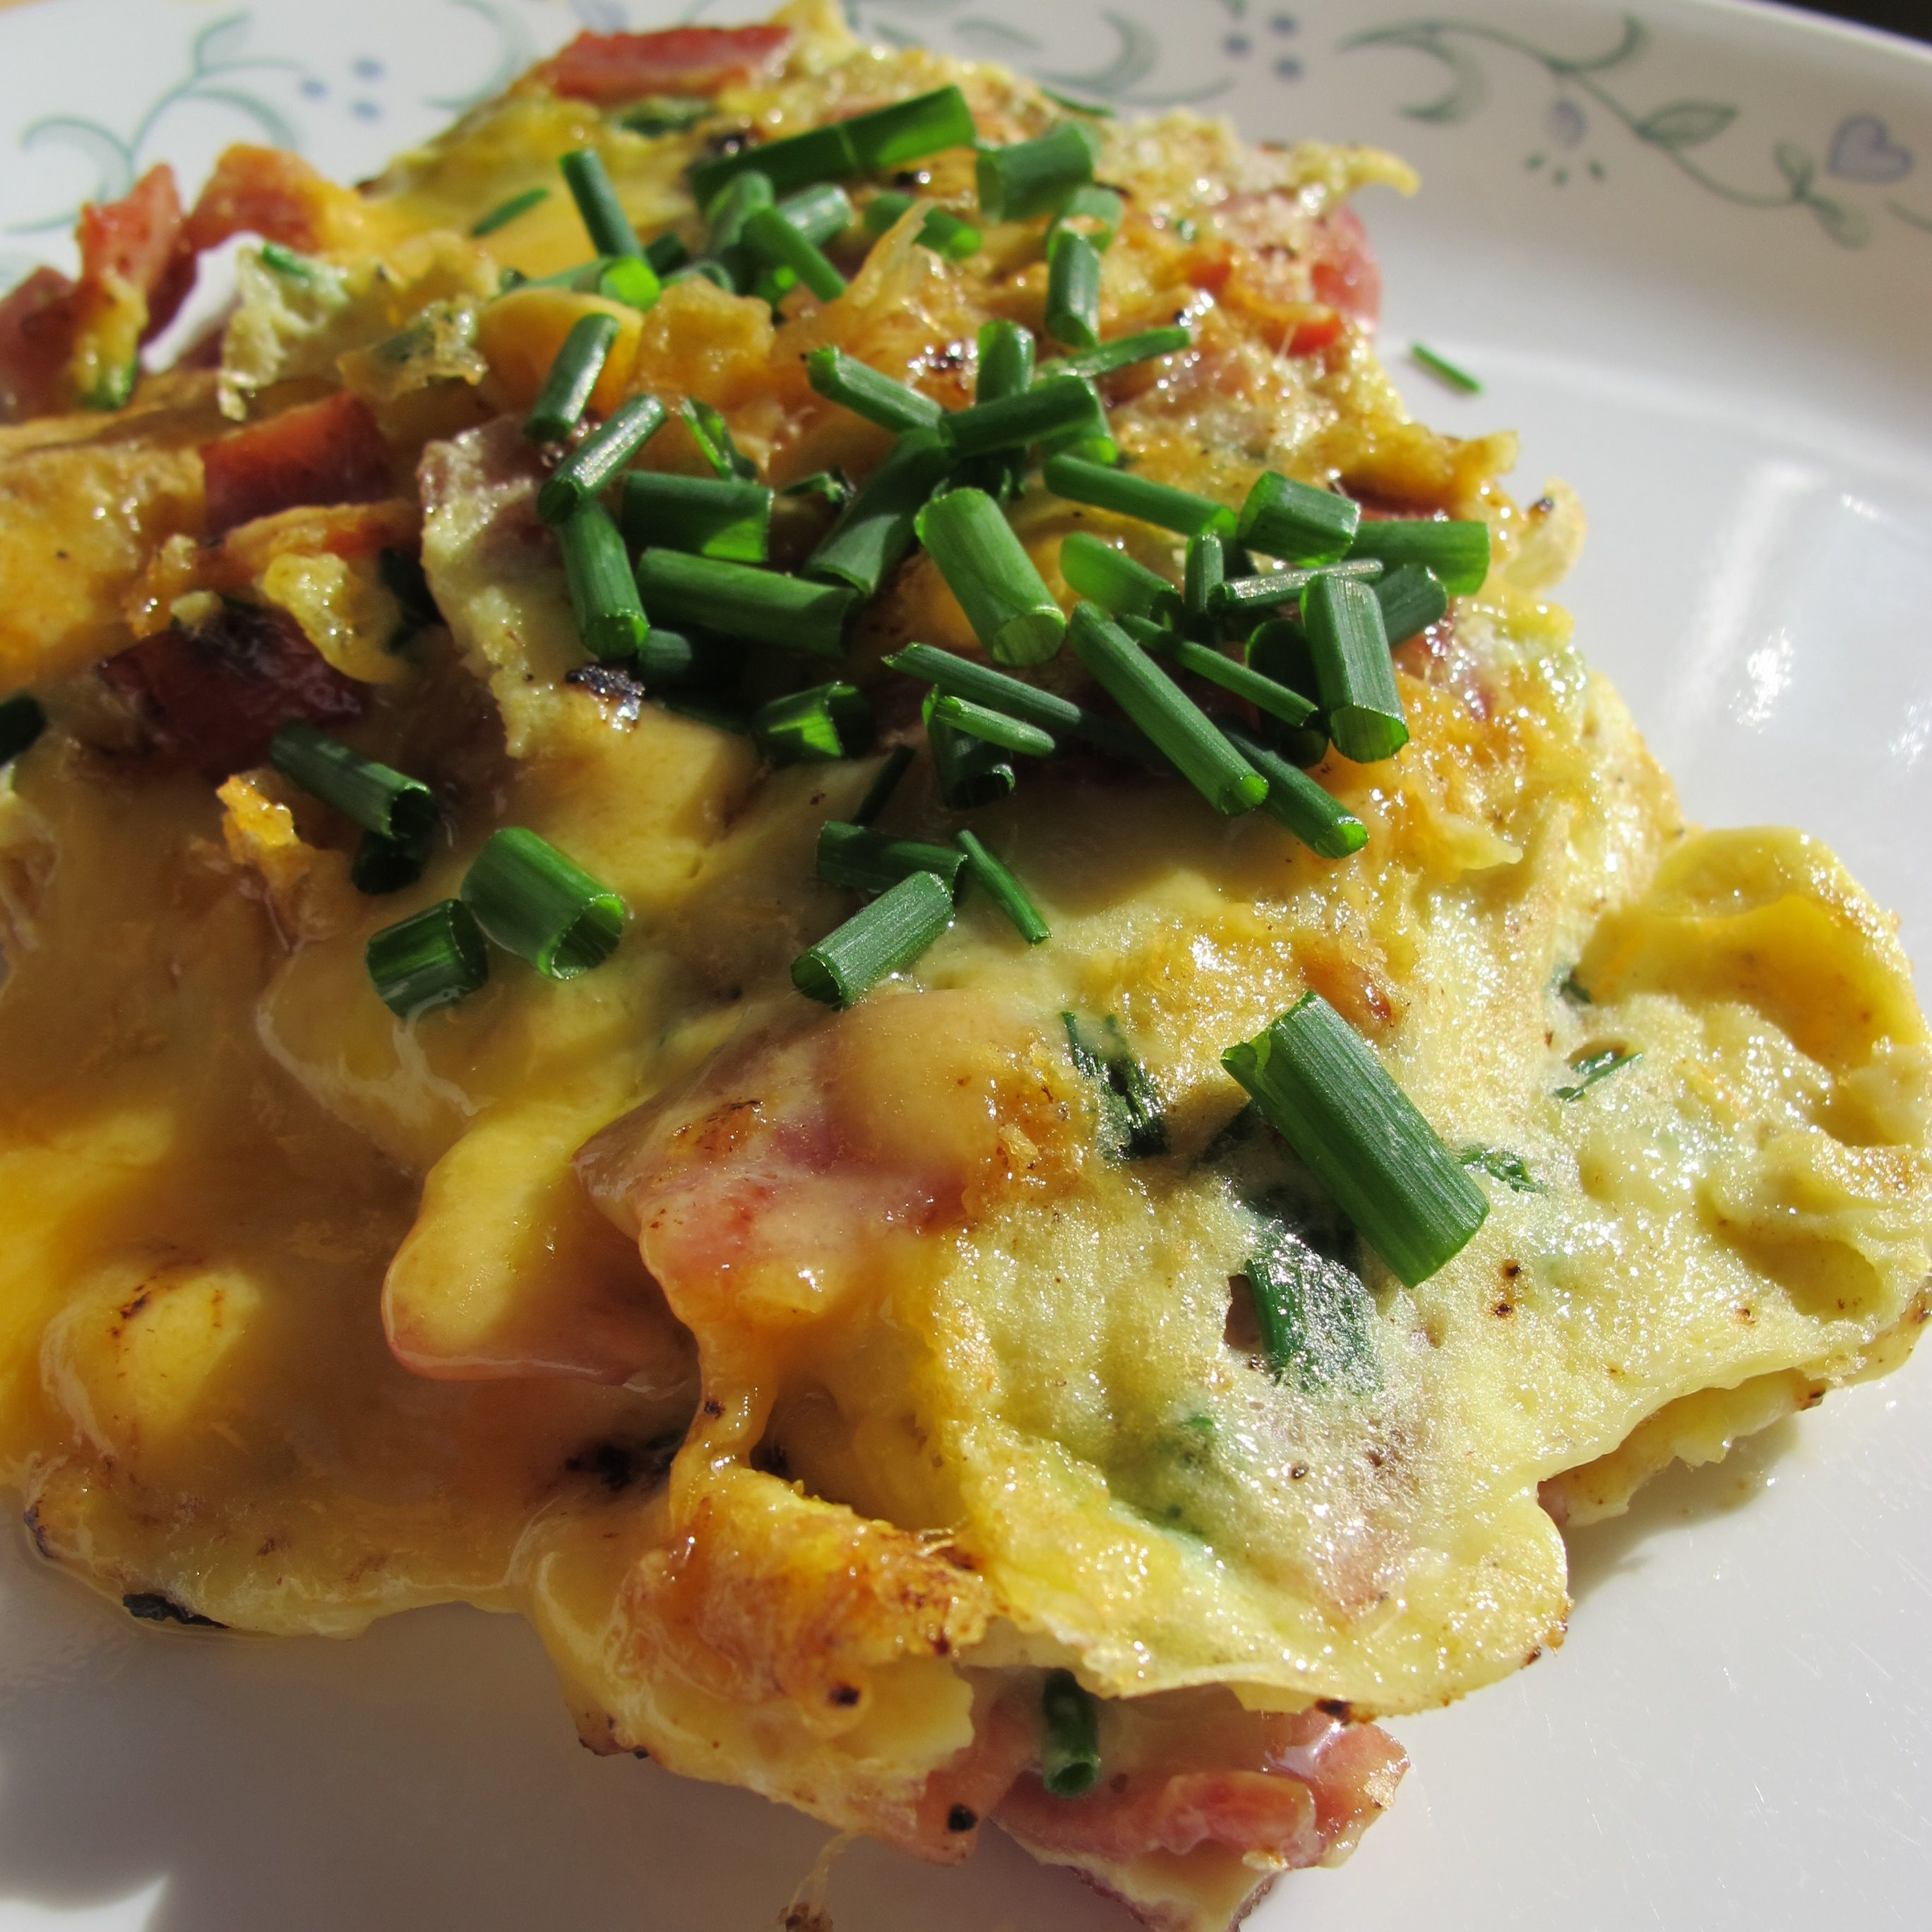 Ham and Cheese Omelette AllrecipesPhoto